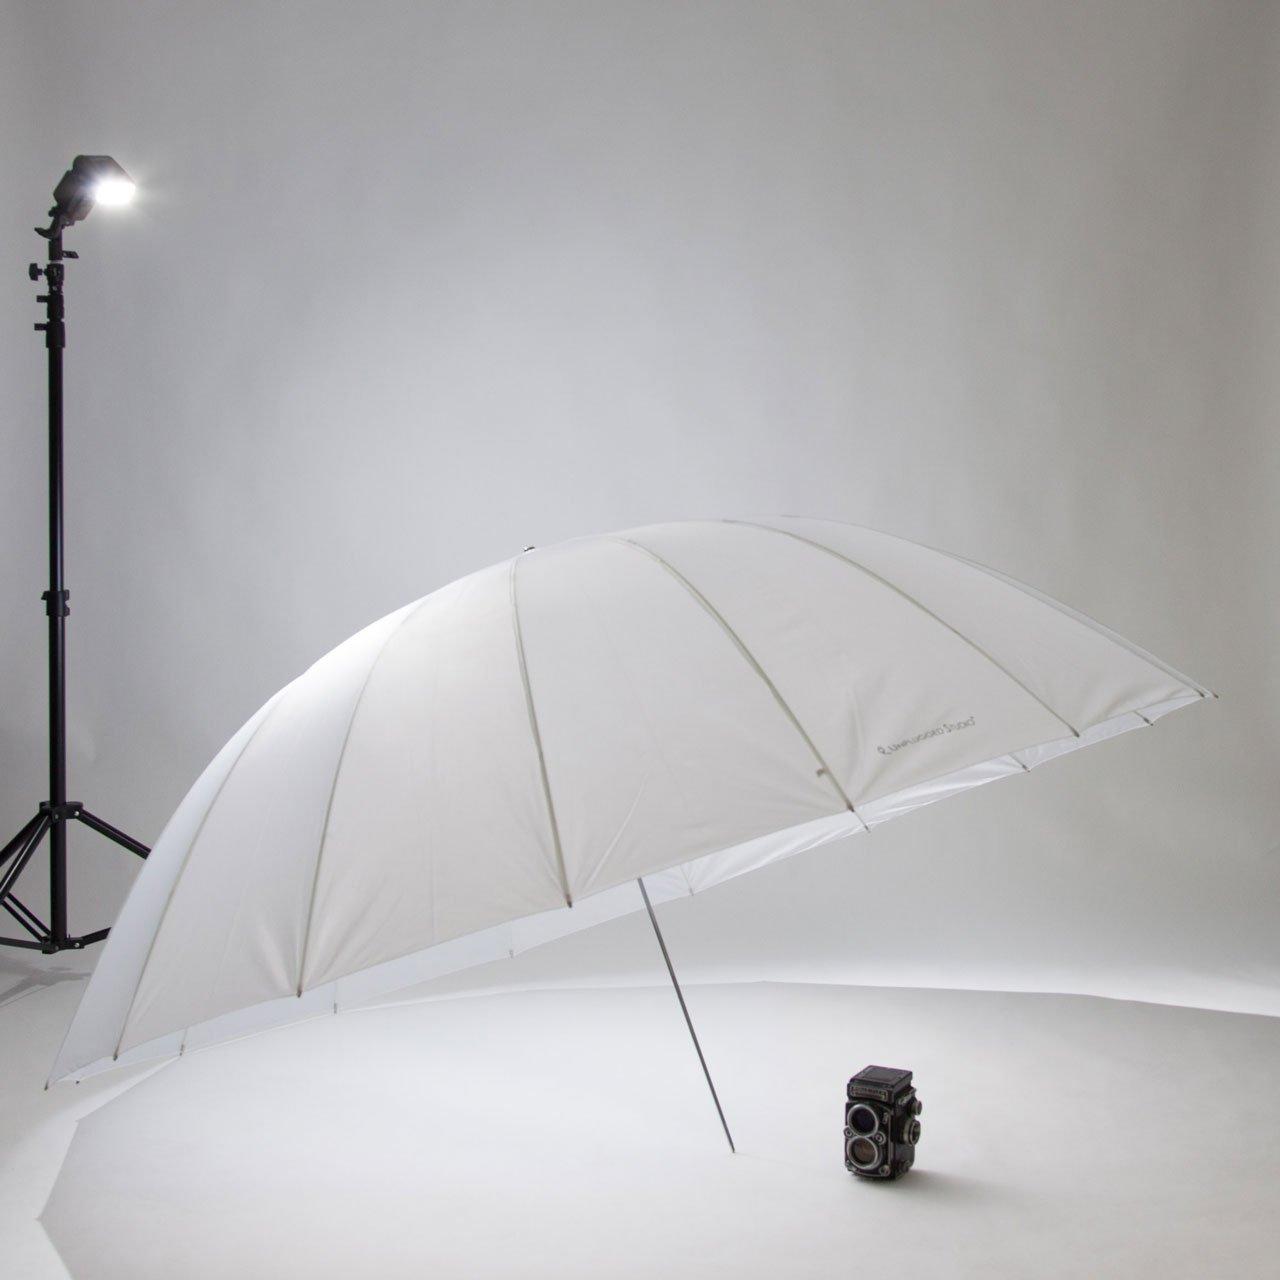 UNPLUGGED STUDIO 70inch Translucent Umbrella (16 Fiberglass Ribs) by UNPLUGGED STUDIO (Image #8)